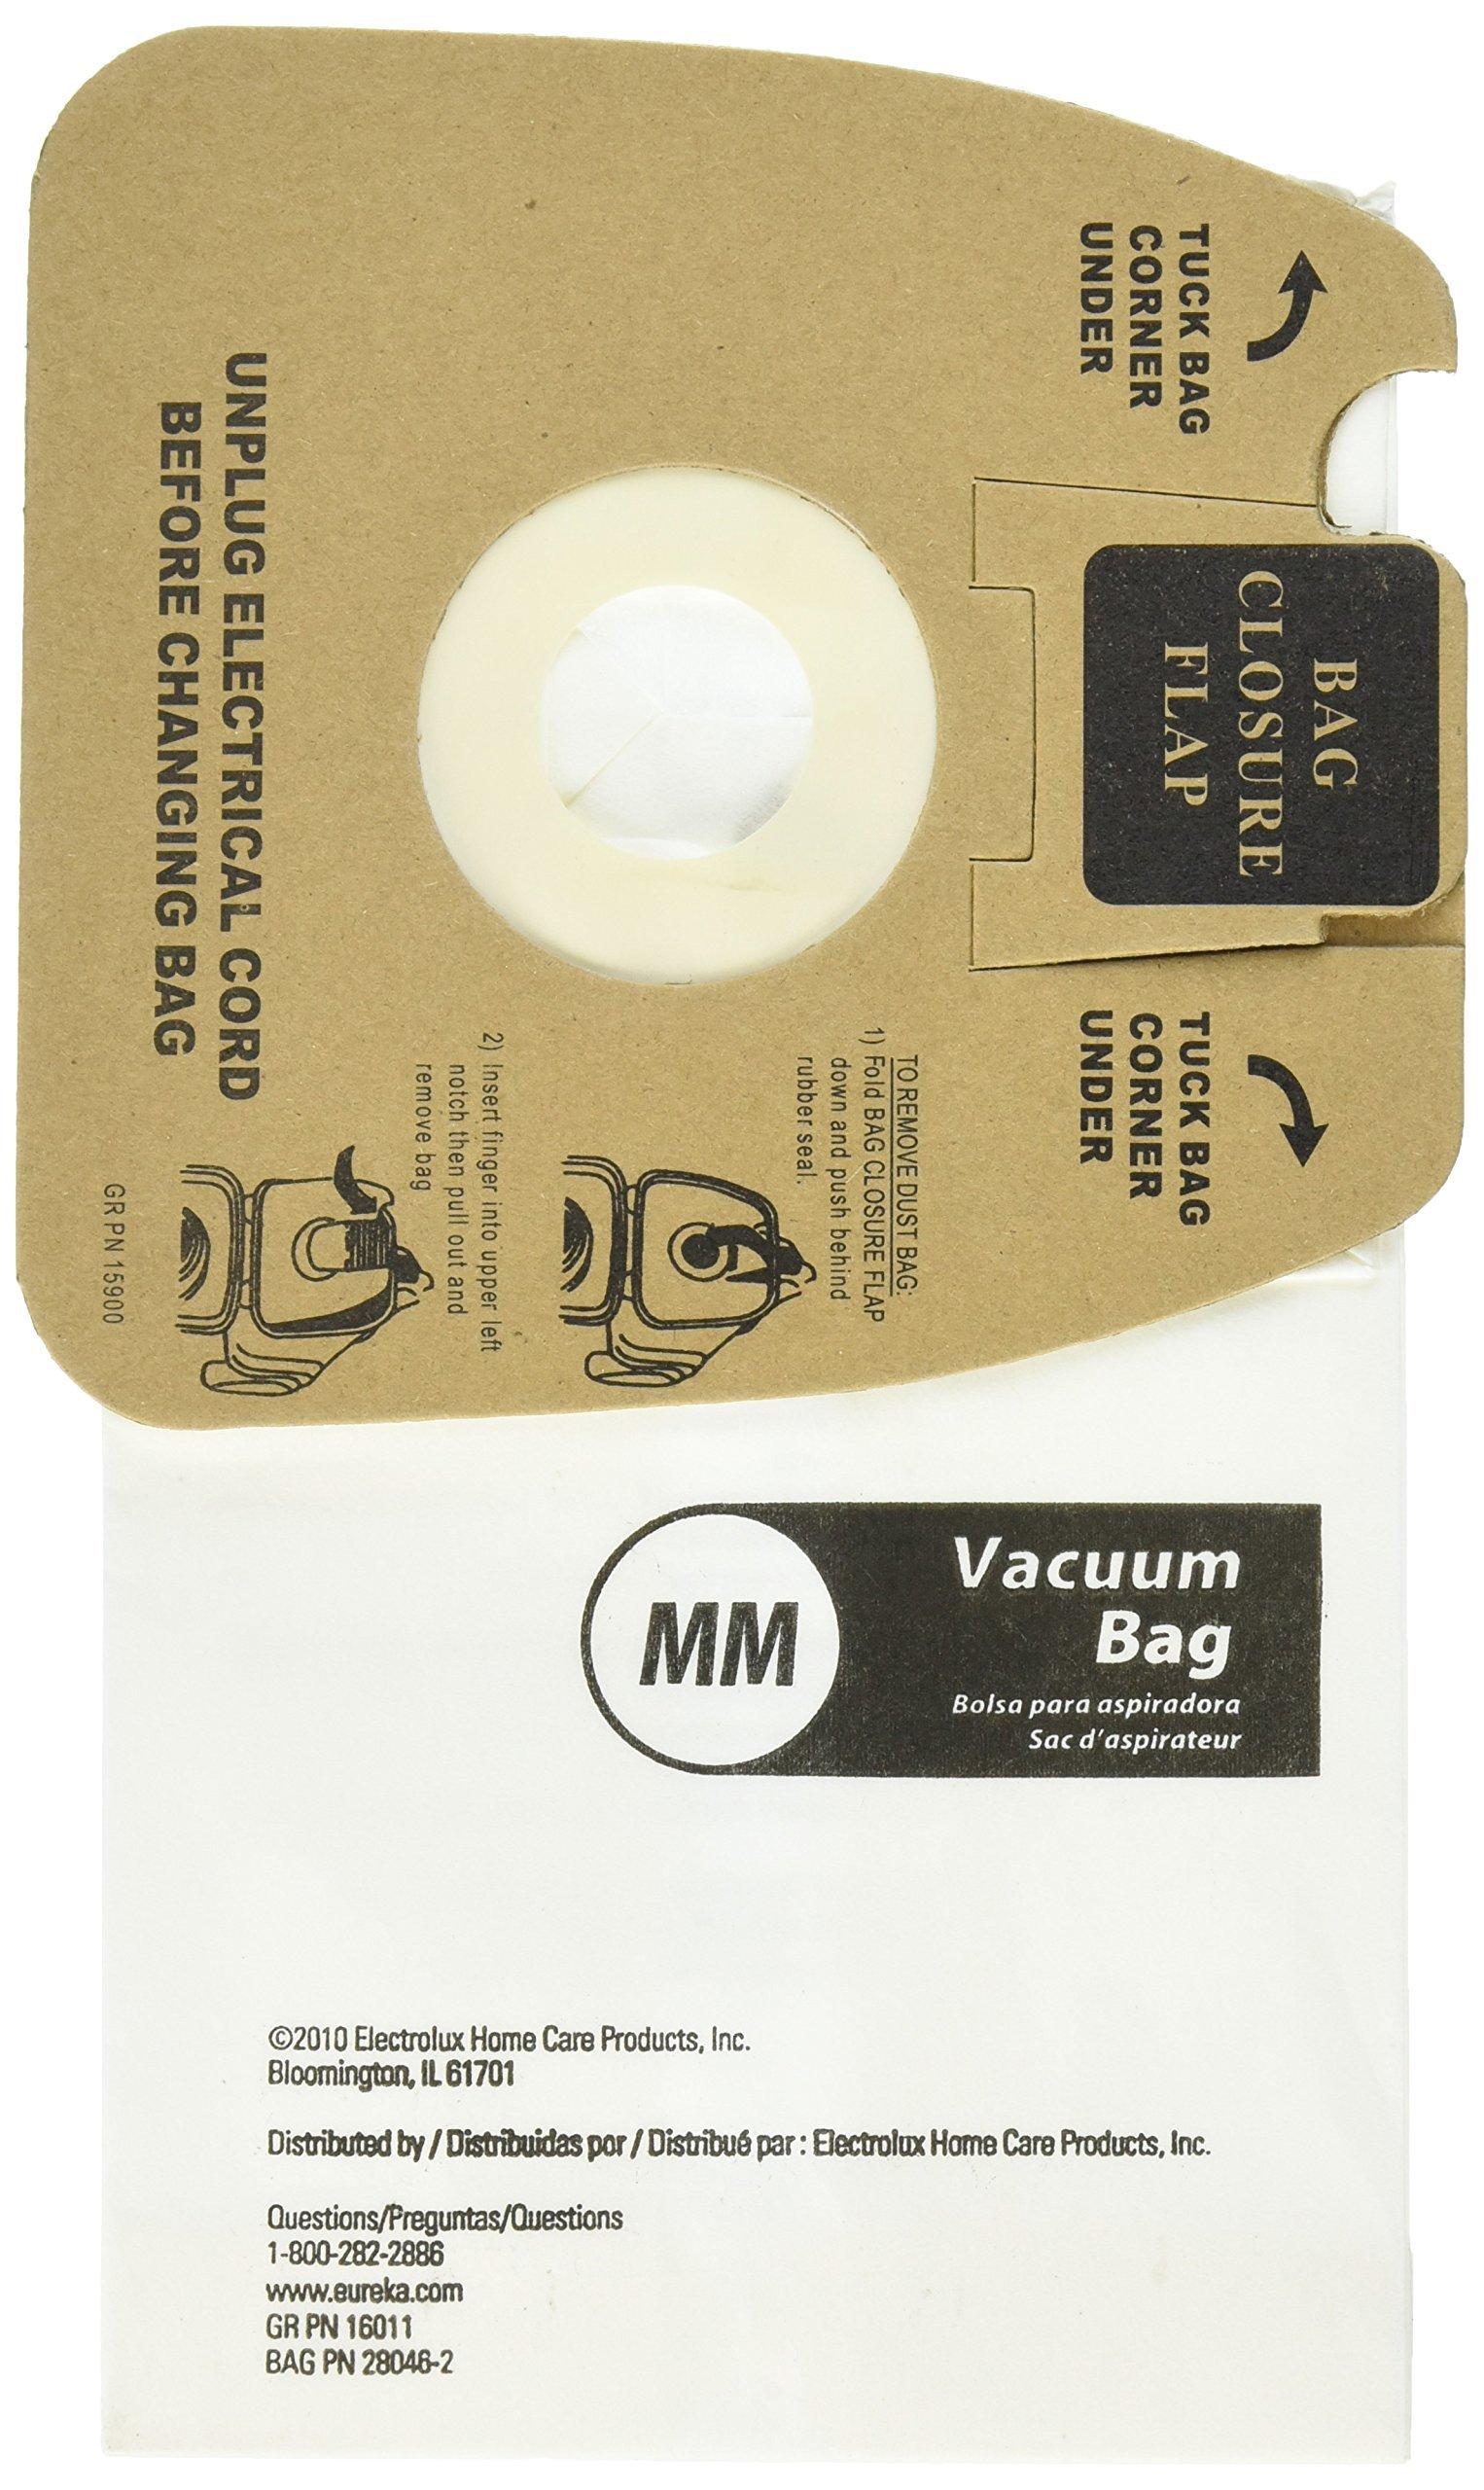 Genuine Eureka MM Vacuum Bag 60297A Style -(2 packs of 10 = 20 Bags) by Eureka